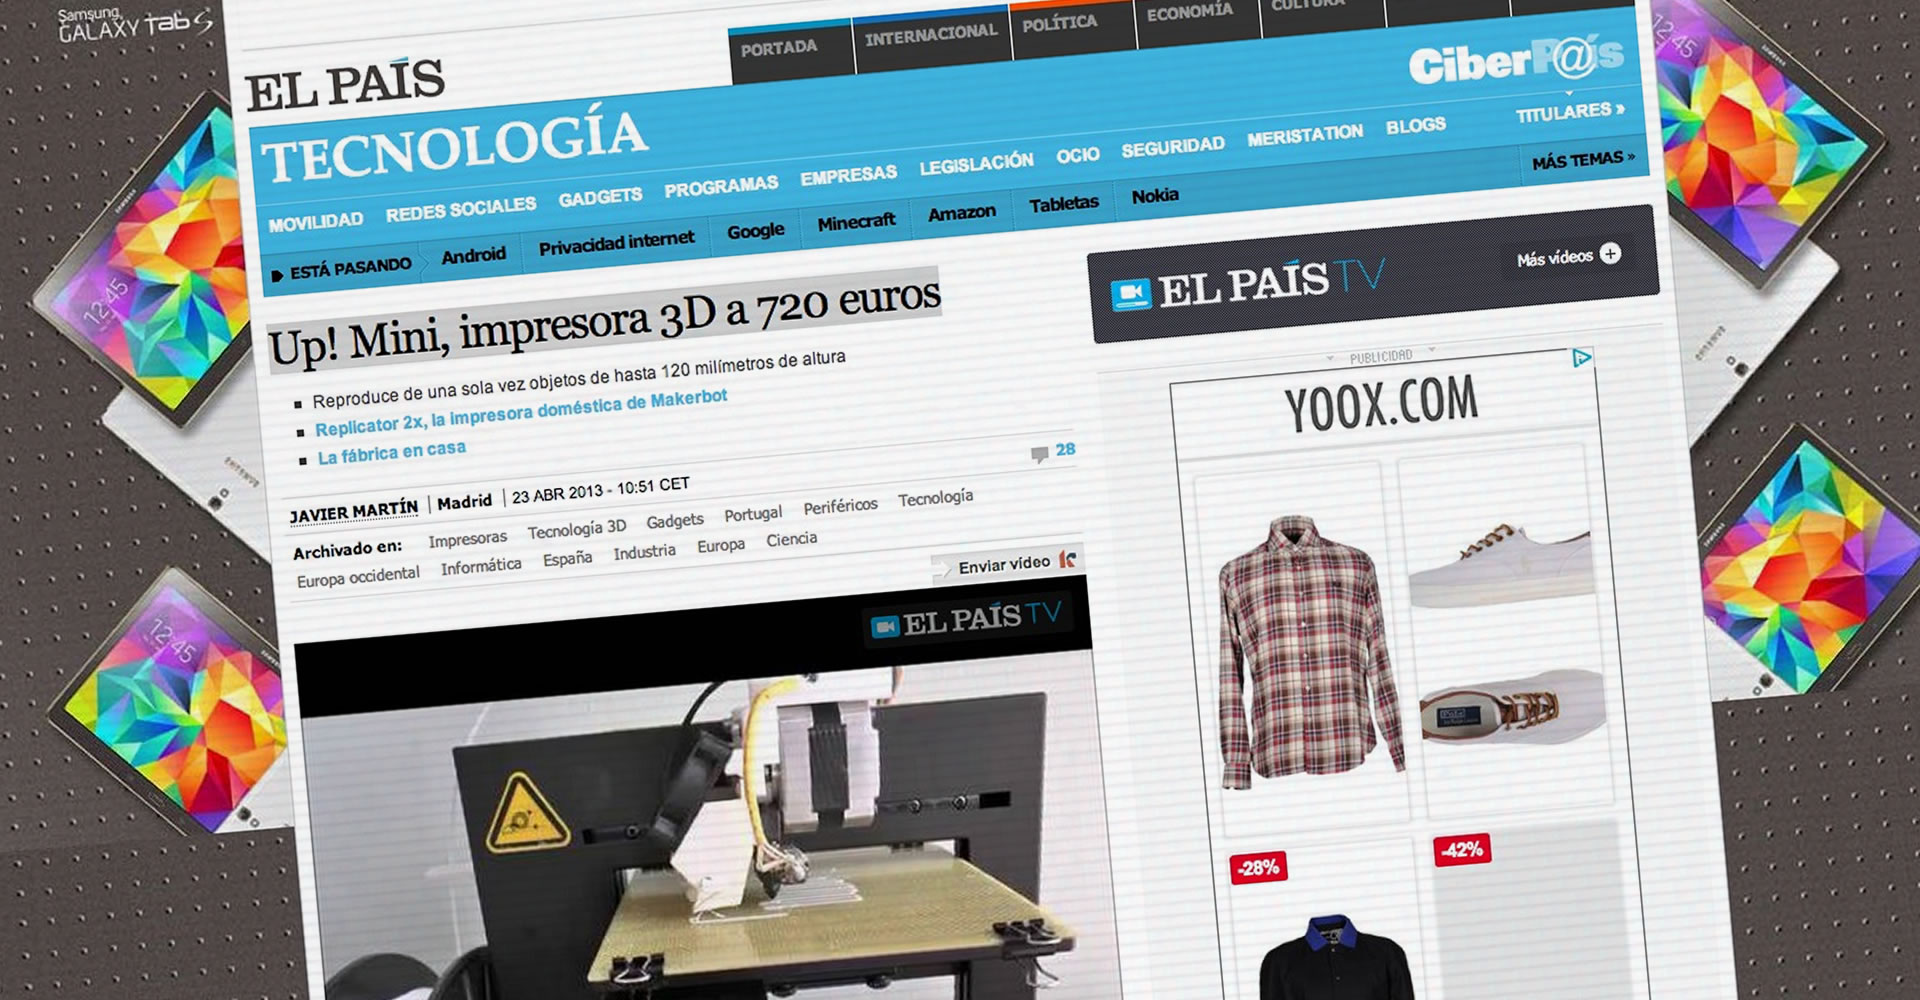 Up! Mini, impresora 3D a 720 euros. El País Tecnología. Ciberpaís